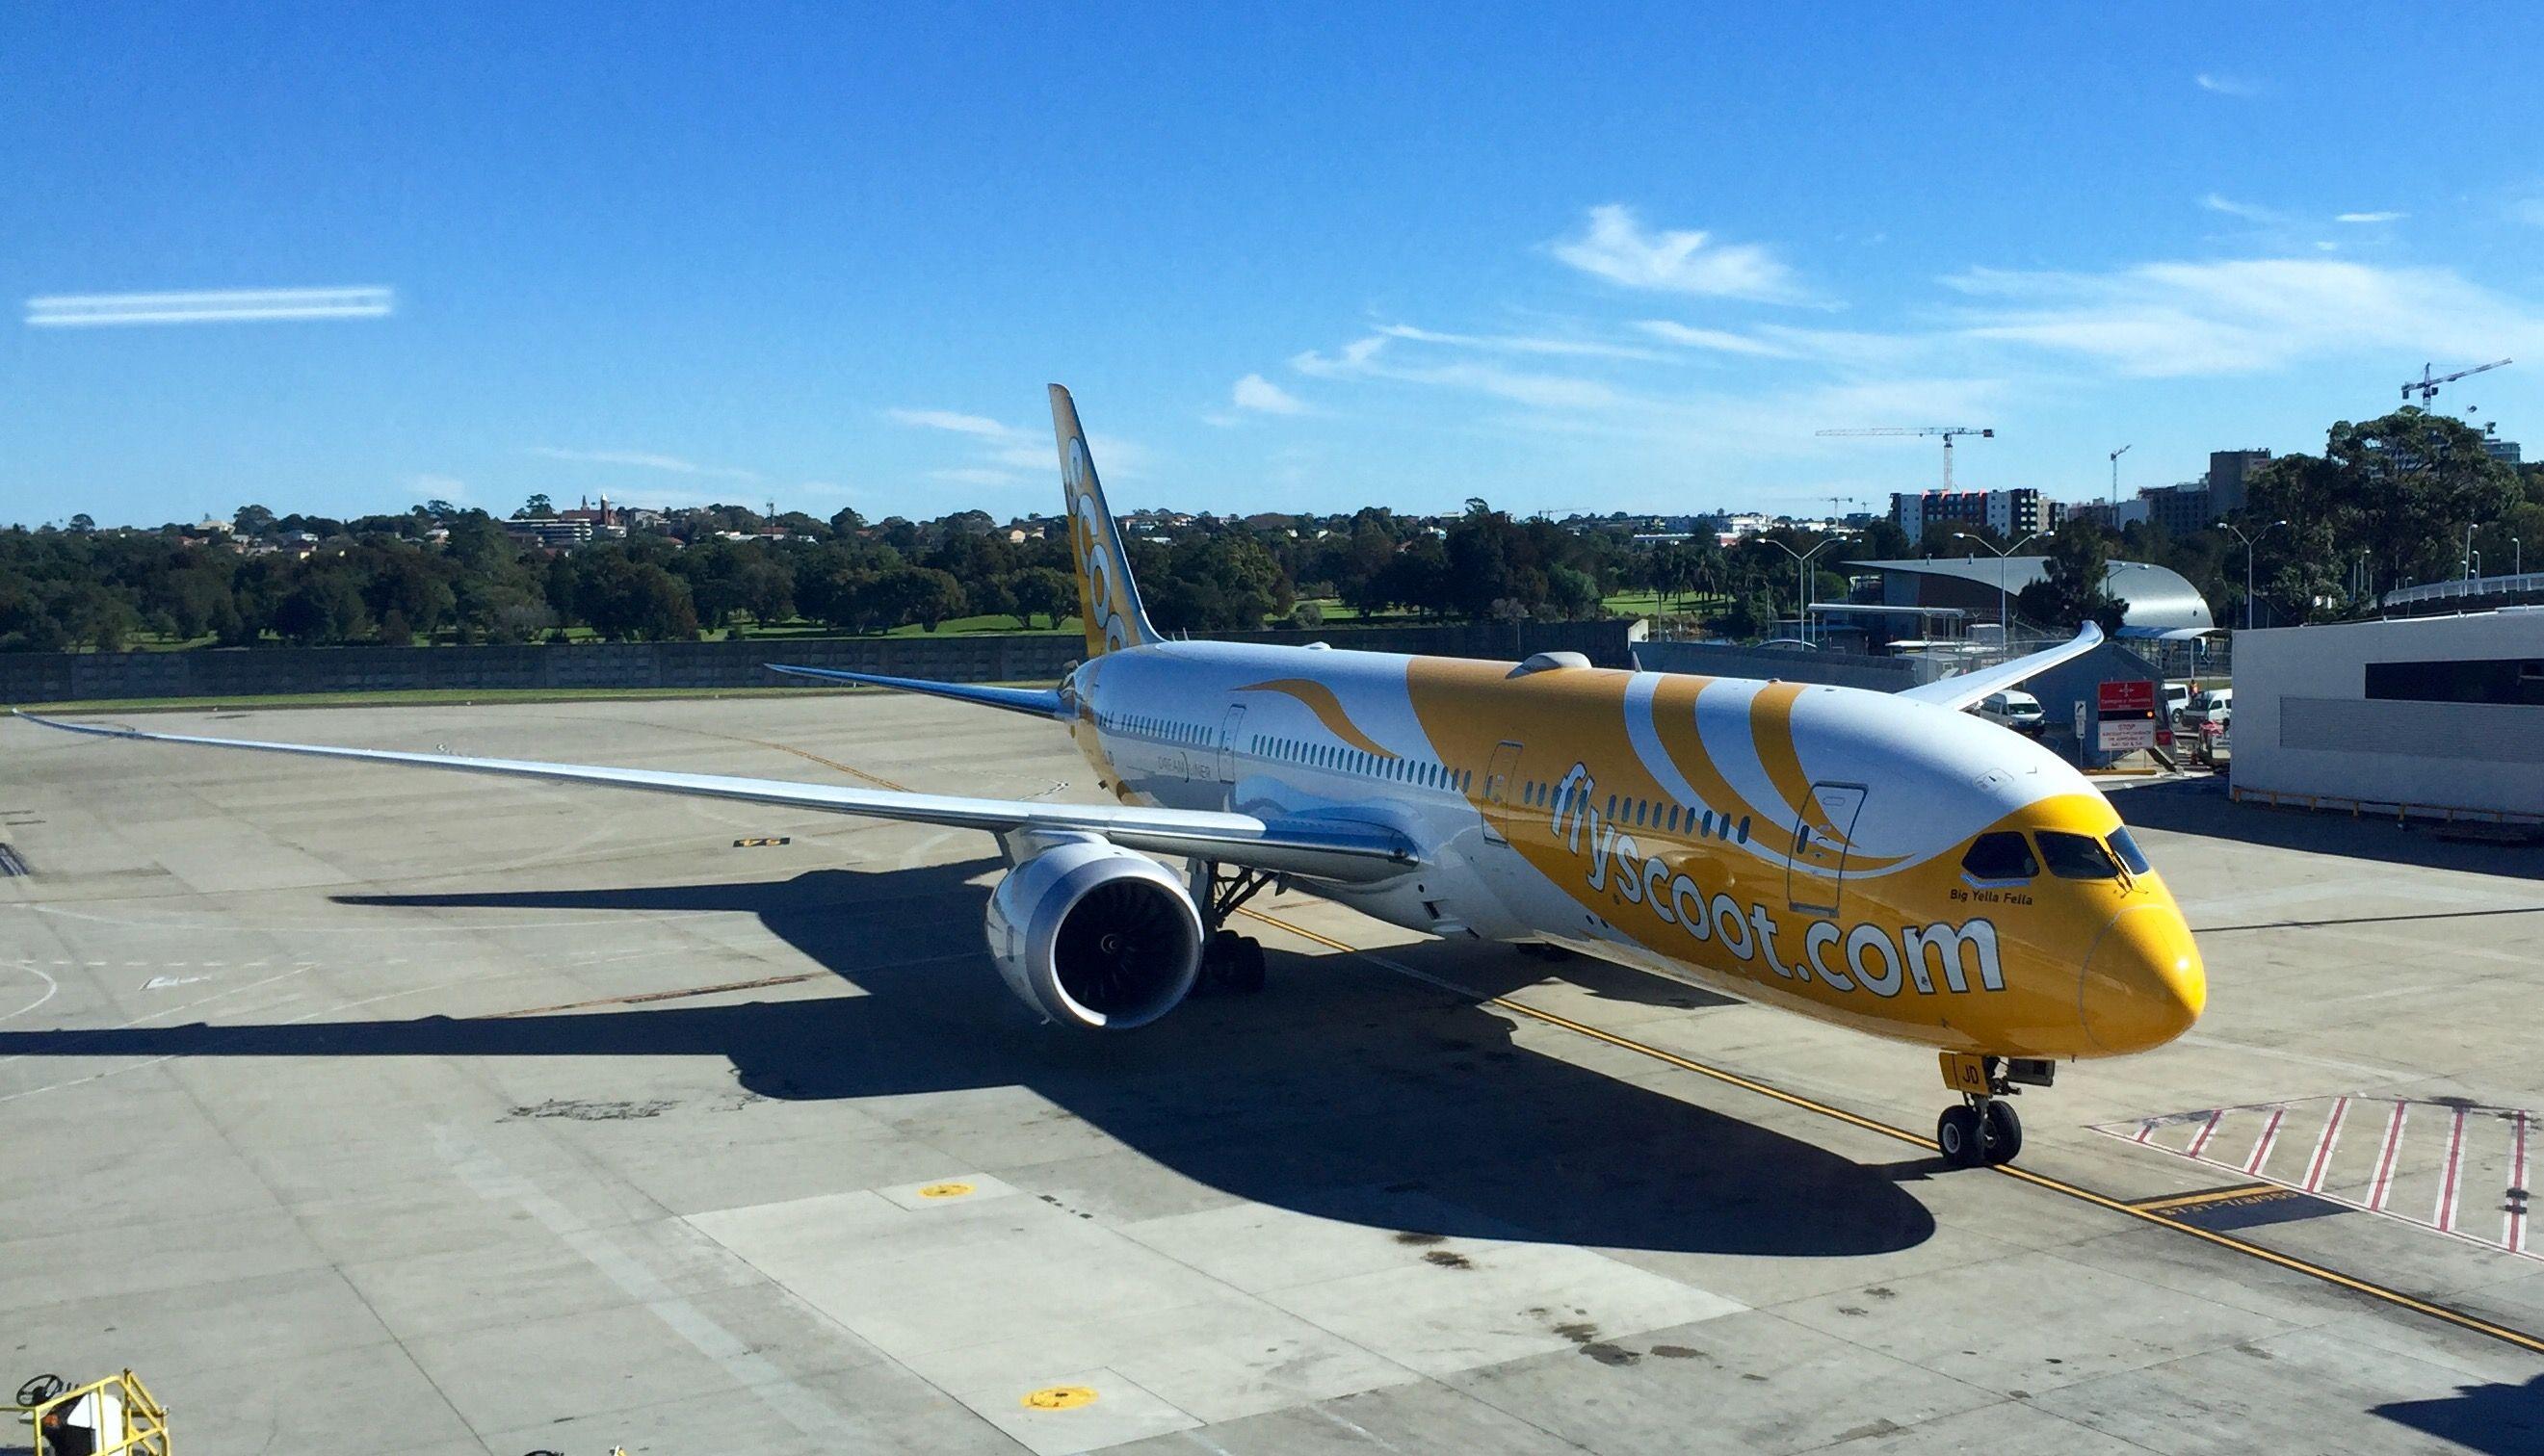 Pin by Robert Ray on Aerofabulous Passenger jet